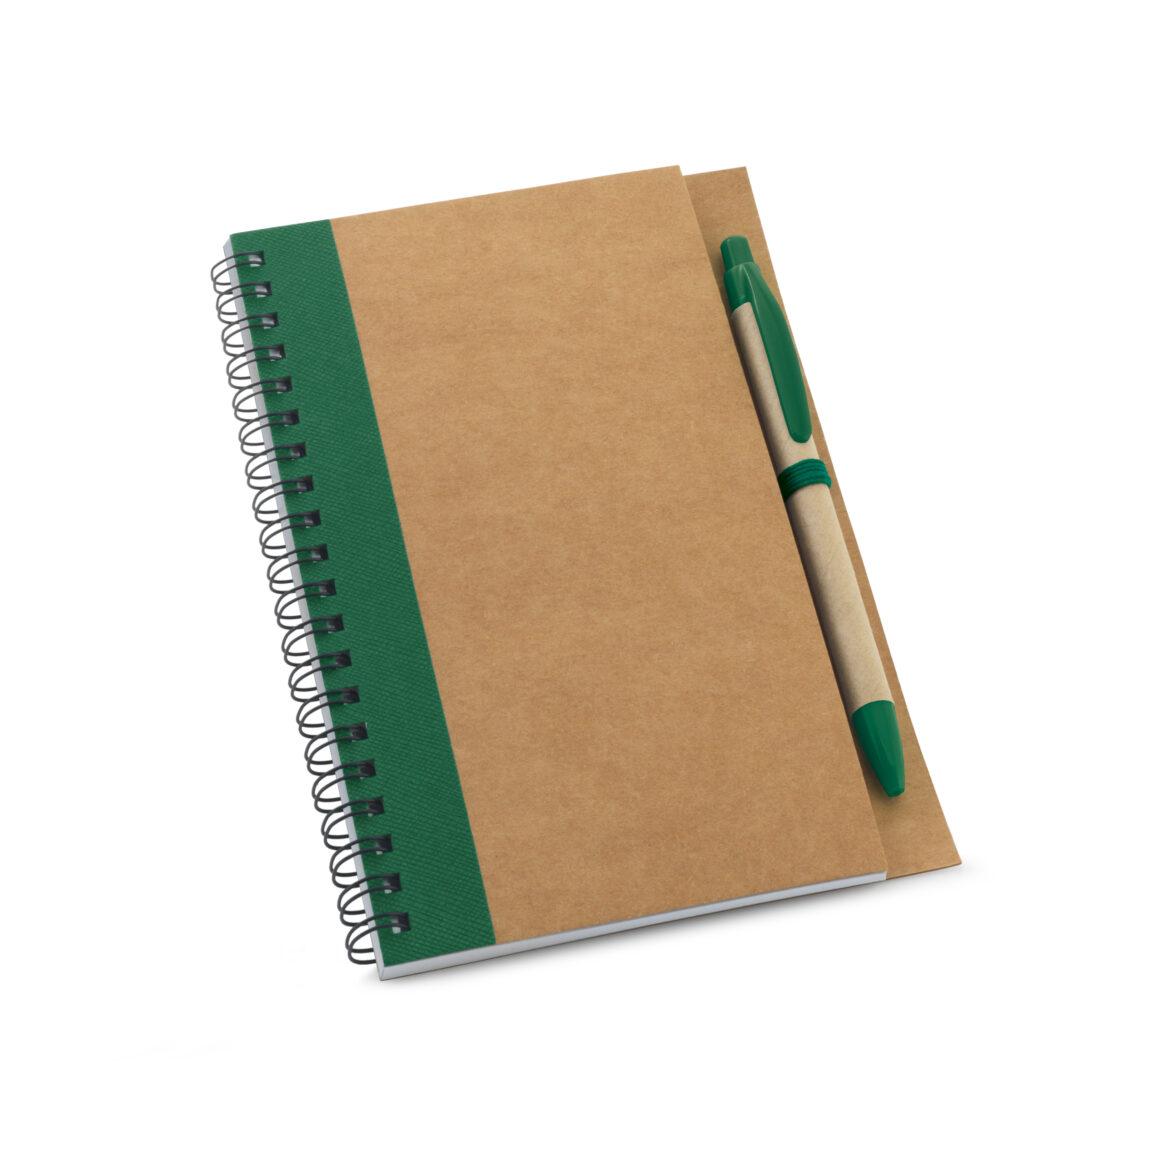 Gweek Notepad Product Code GP93715